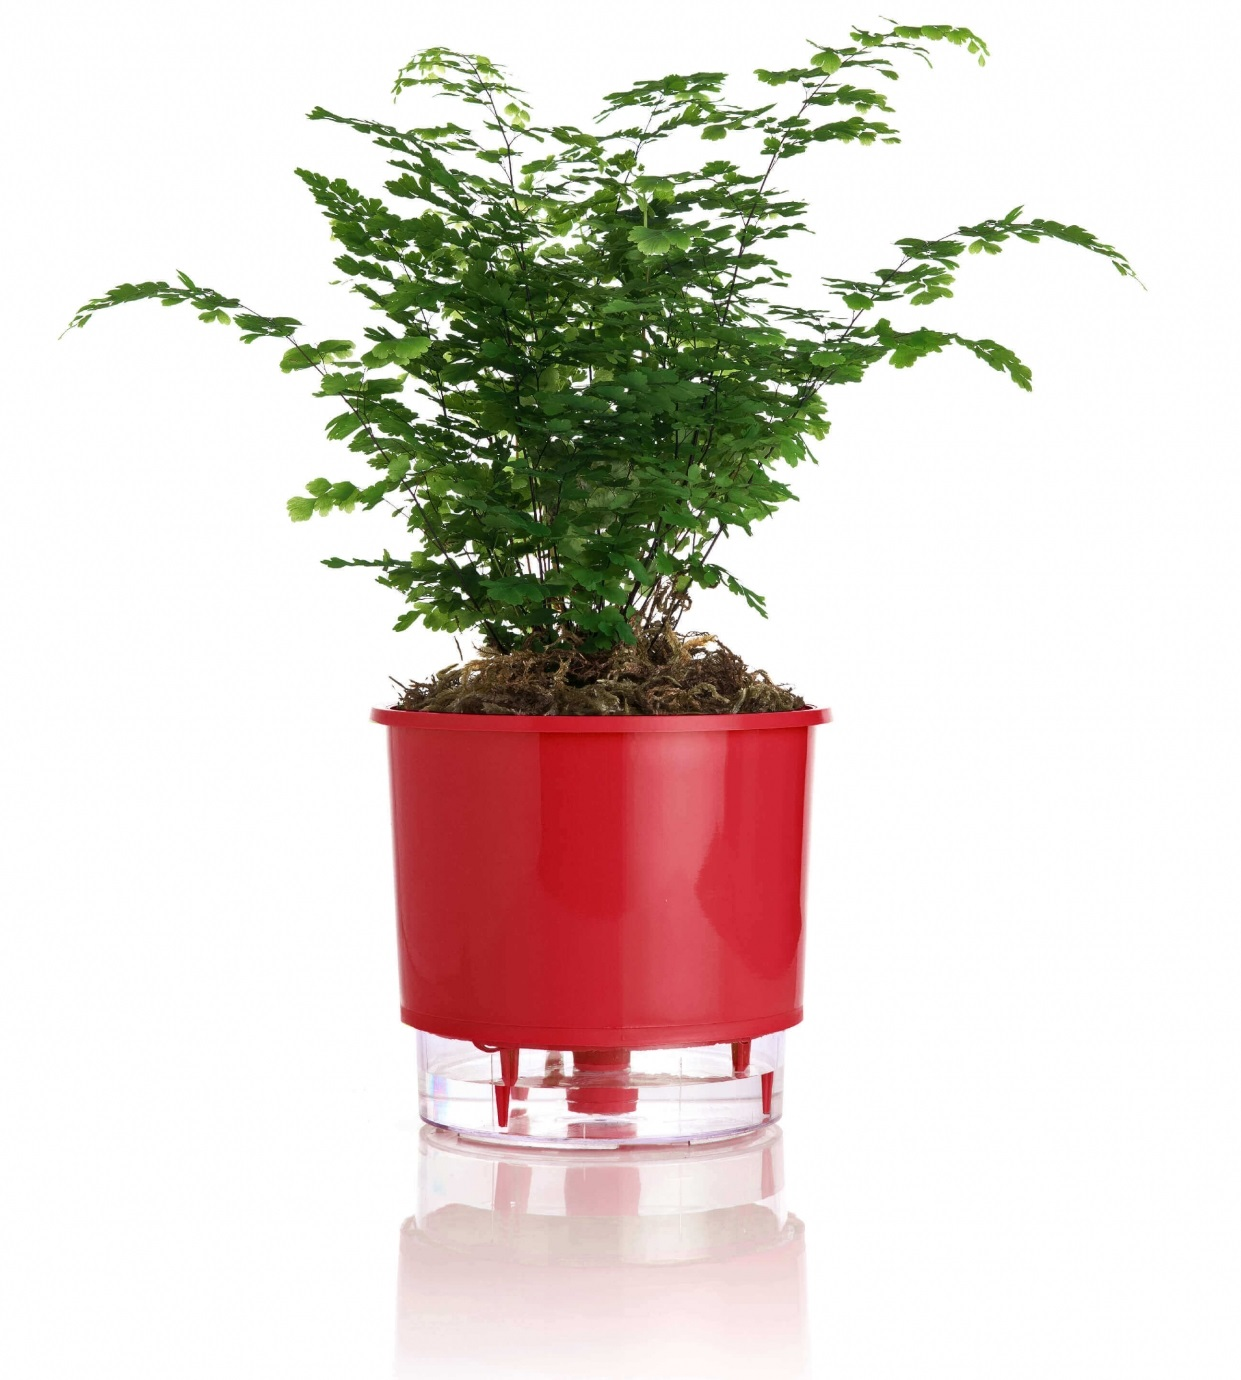 Vaso auto irrigável Raiz MÉDIO N03 16 cm X 14 cm Vermelho